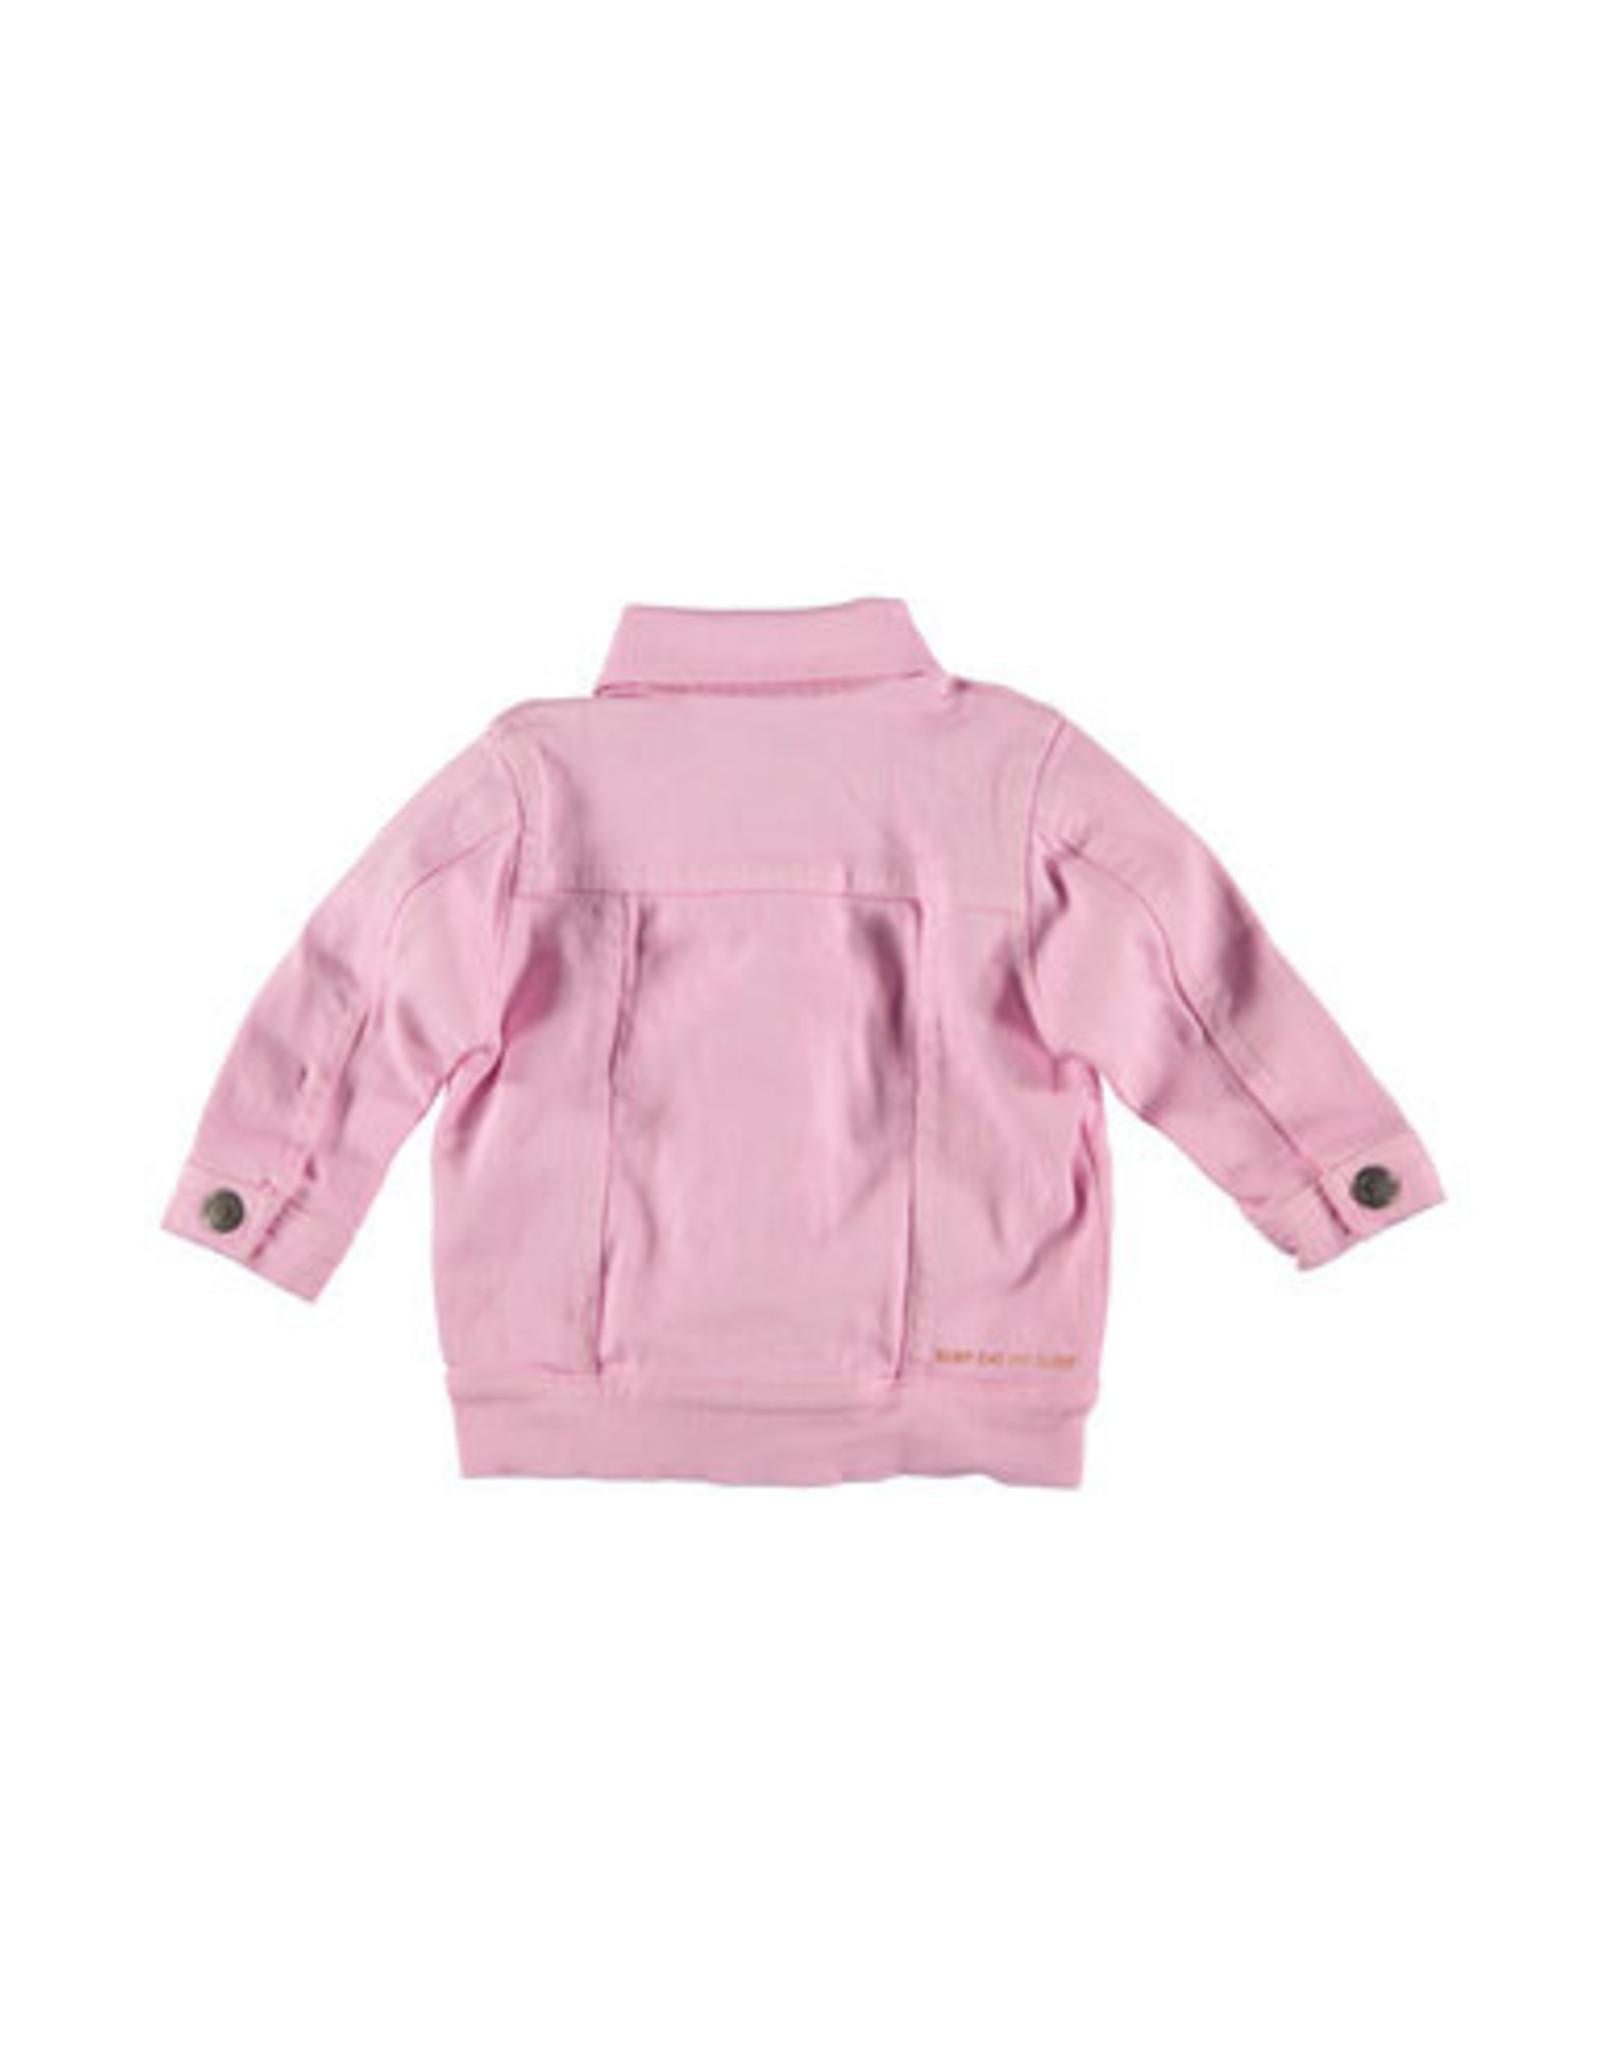 B.E.S.S. Jeans Jacket Ruffles, Pink